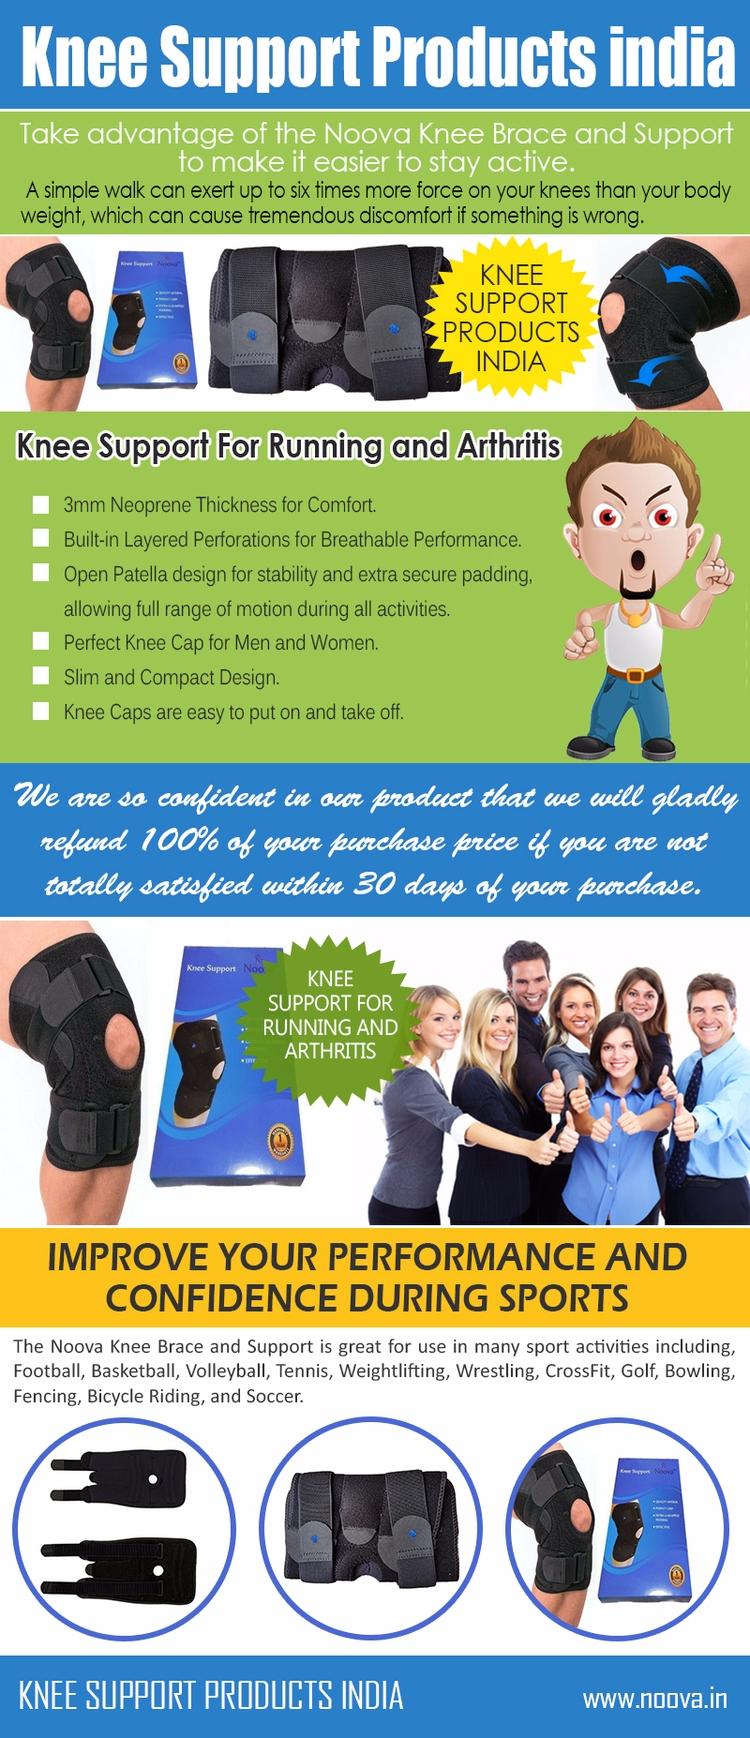 custom fitted Knee Support Prod - kneesupportrunning | ello